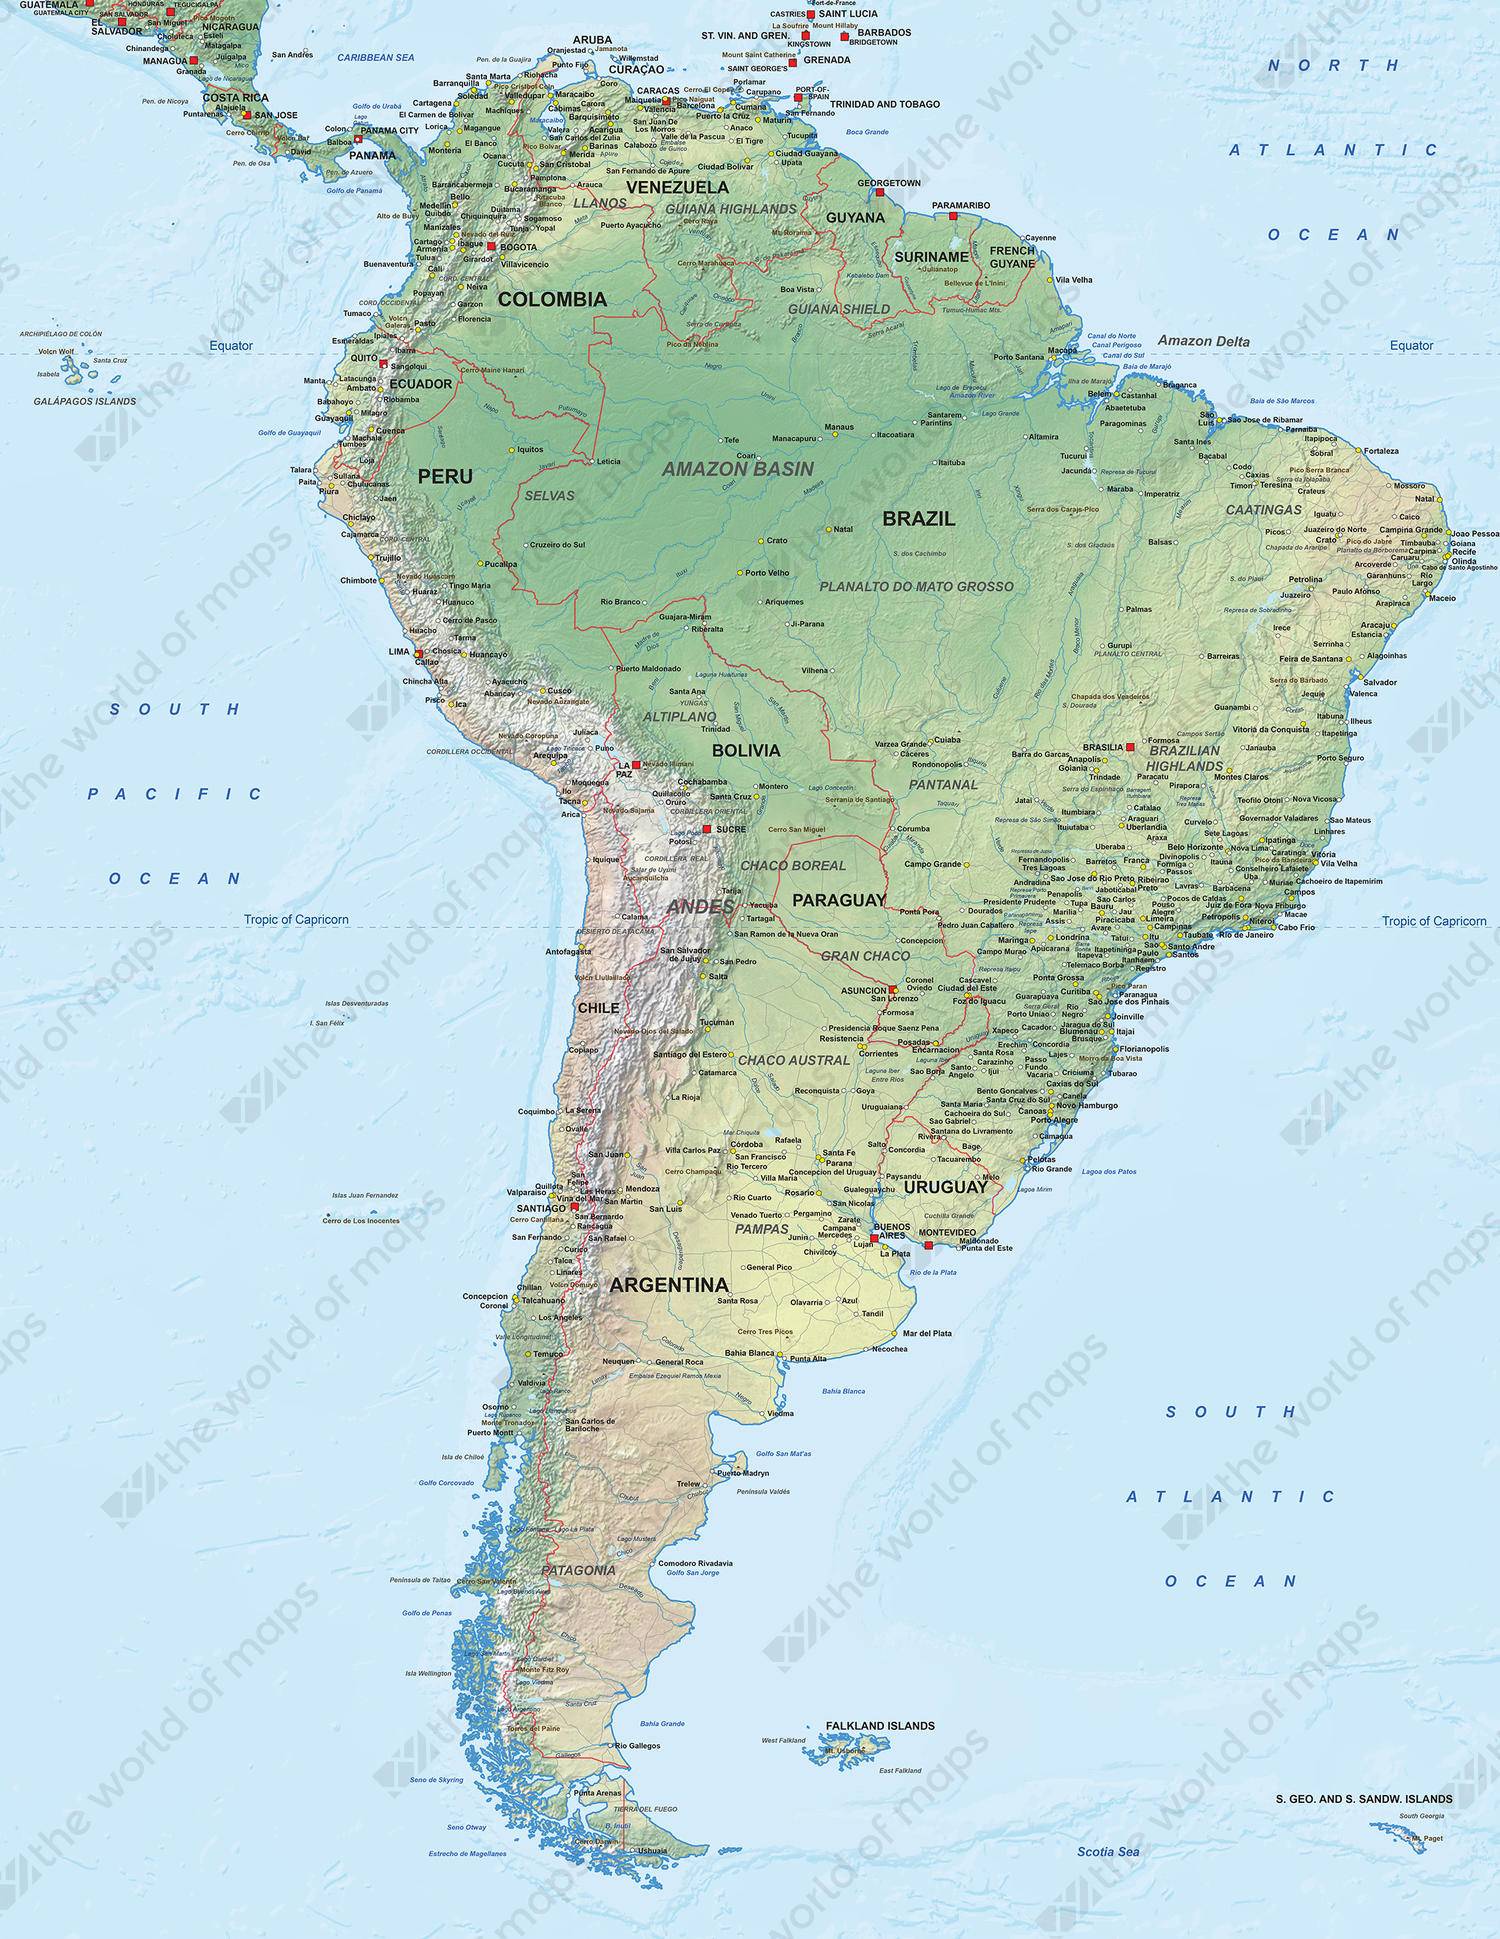 Digital Map South America Physical The World Of Mapscom - Aruba physical map